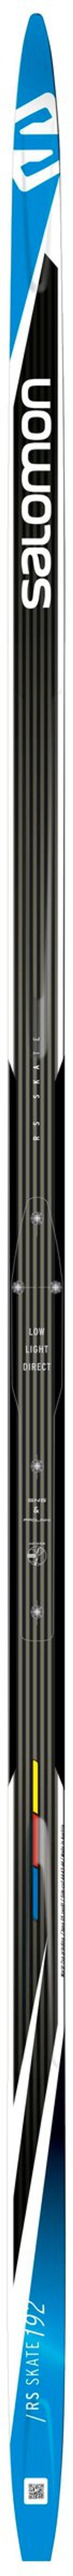 RS Skate inkl. Prolink Pro Skate